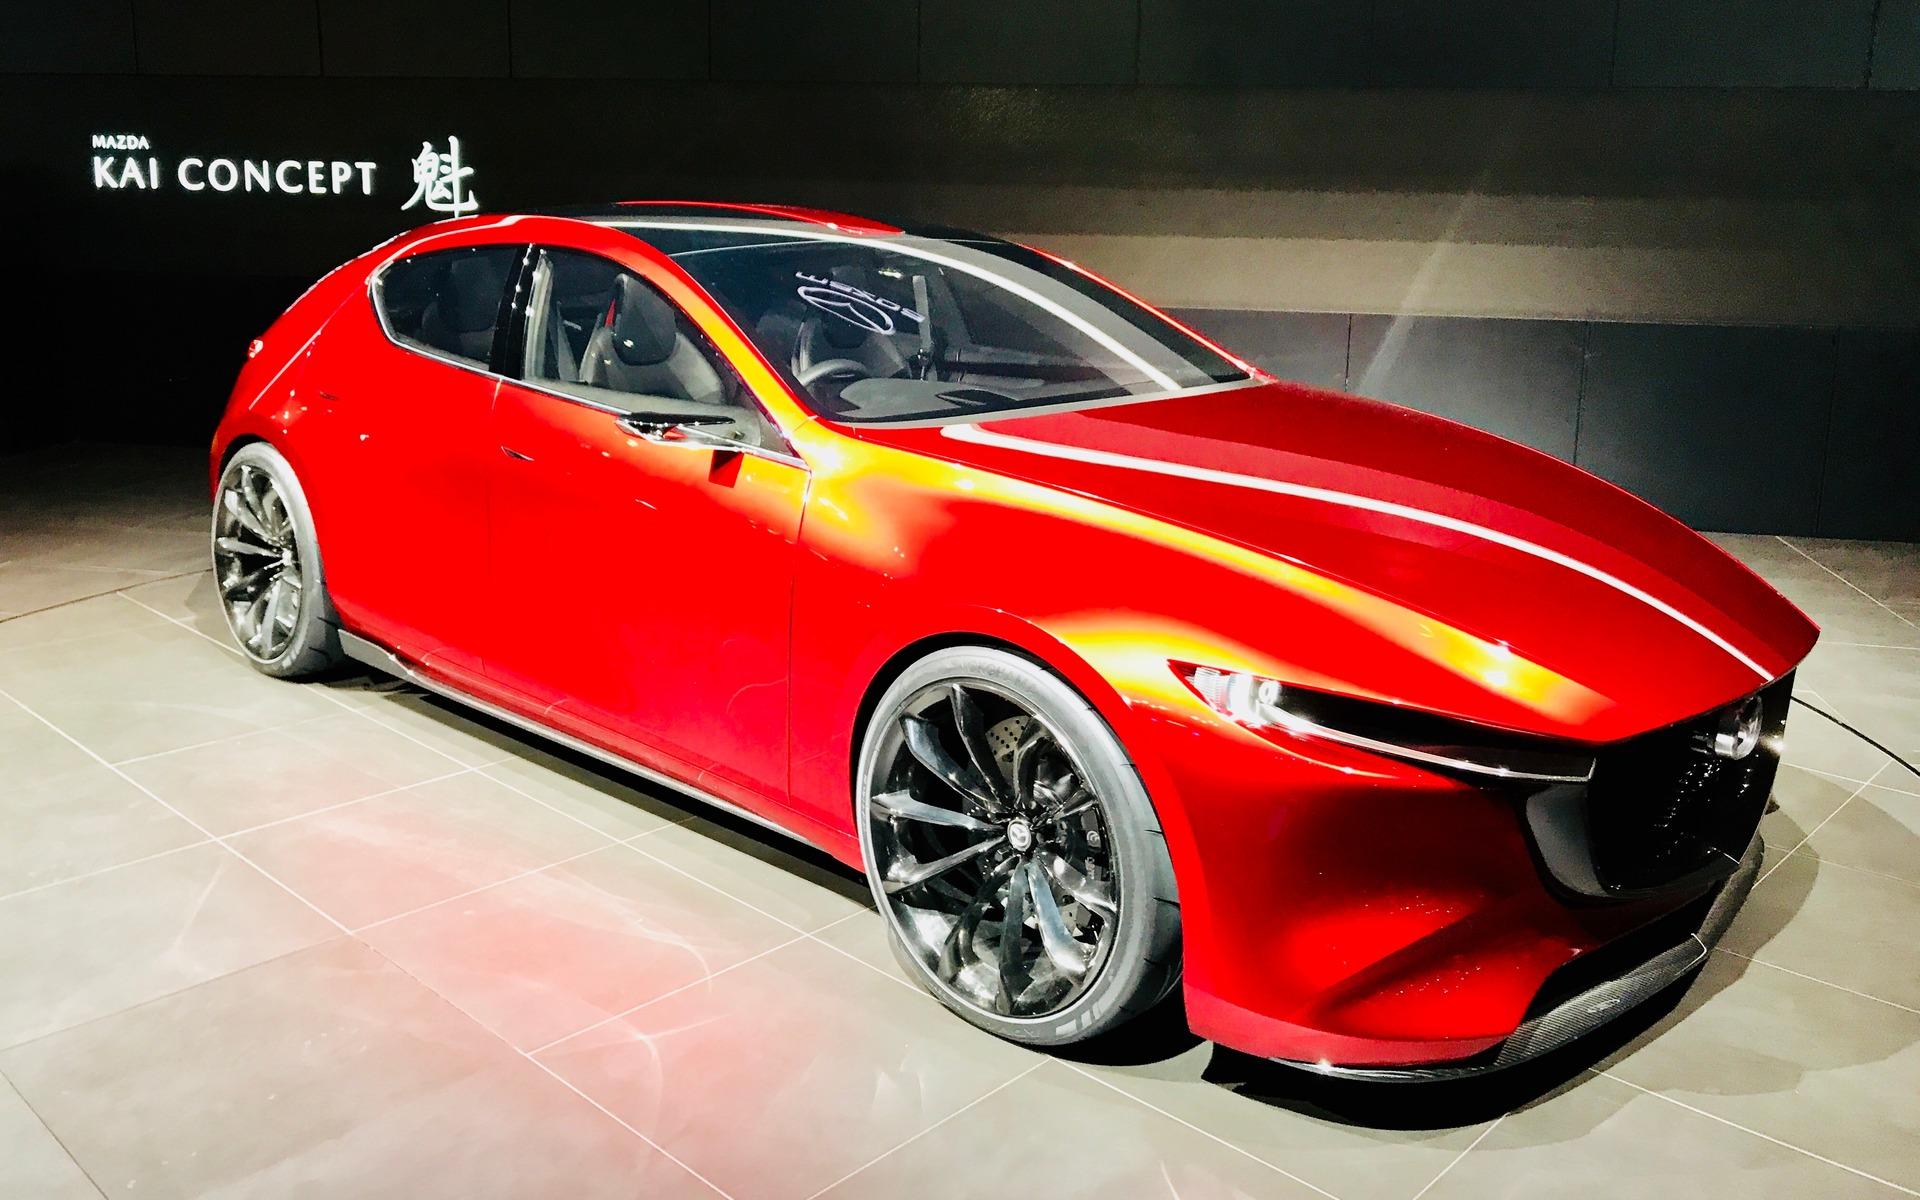 Mazda Kai Concept : La Prochaine Mazda3 Sport